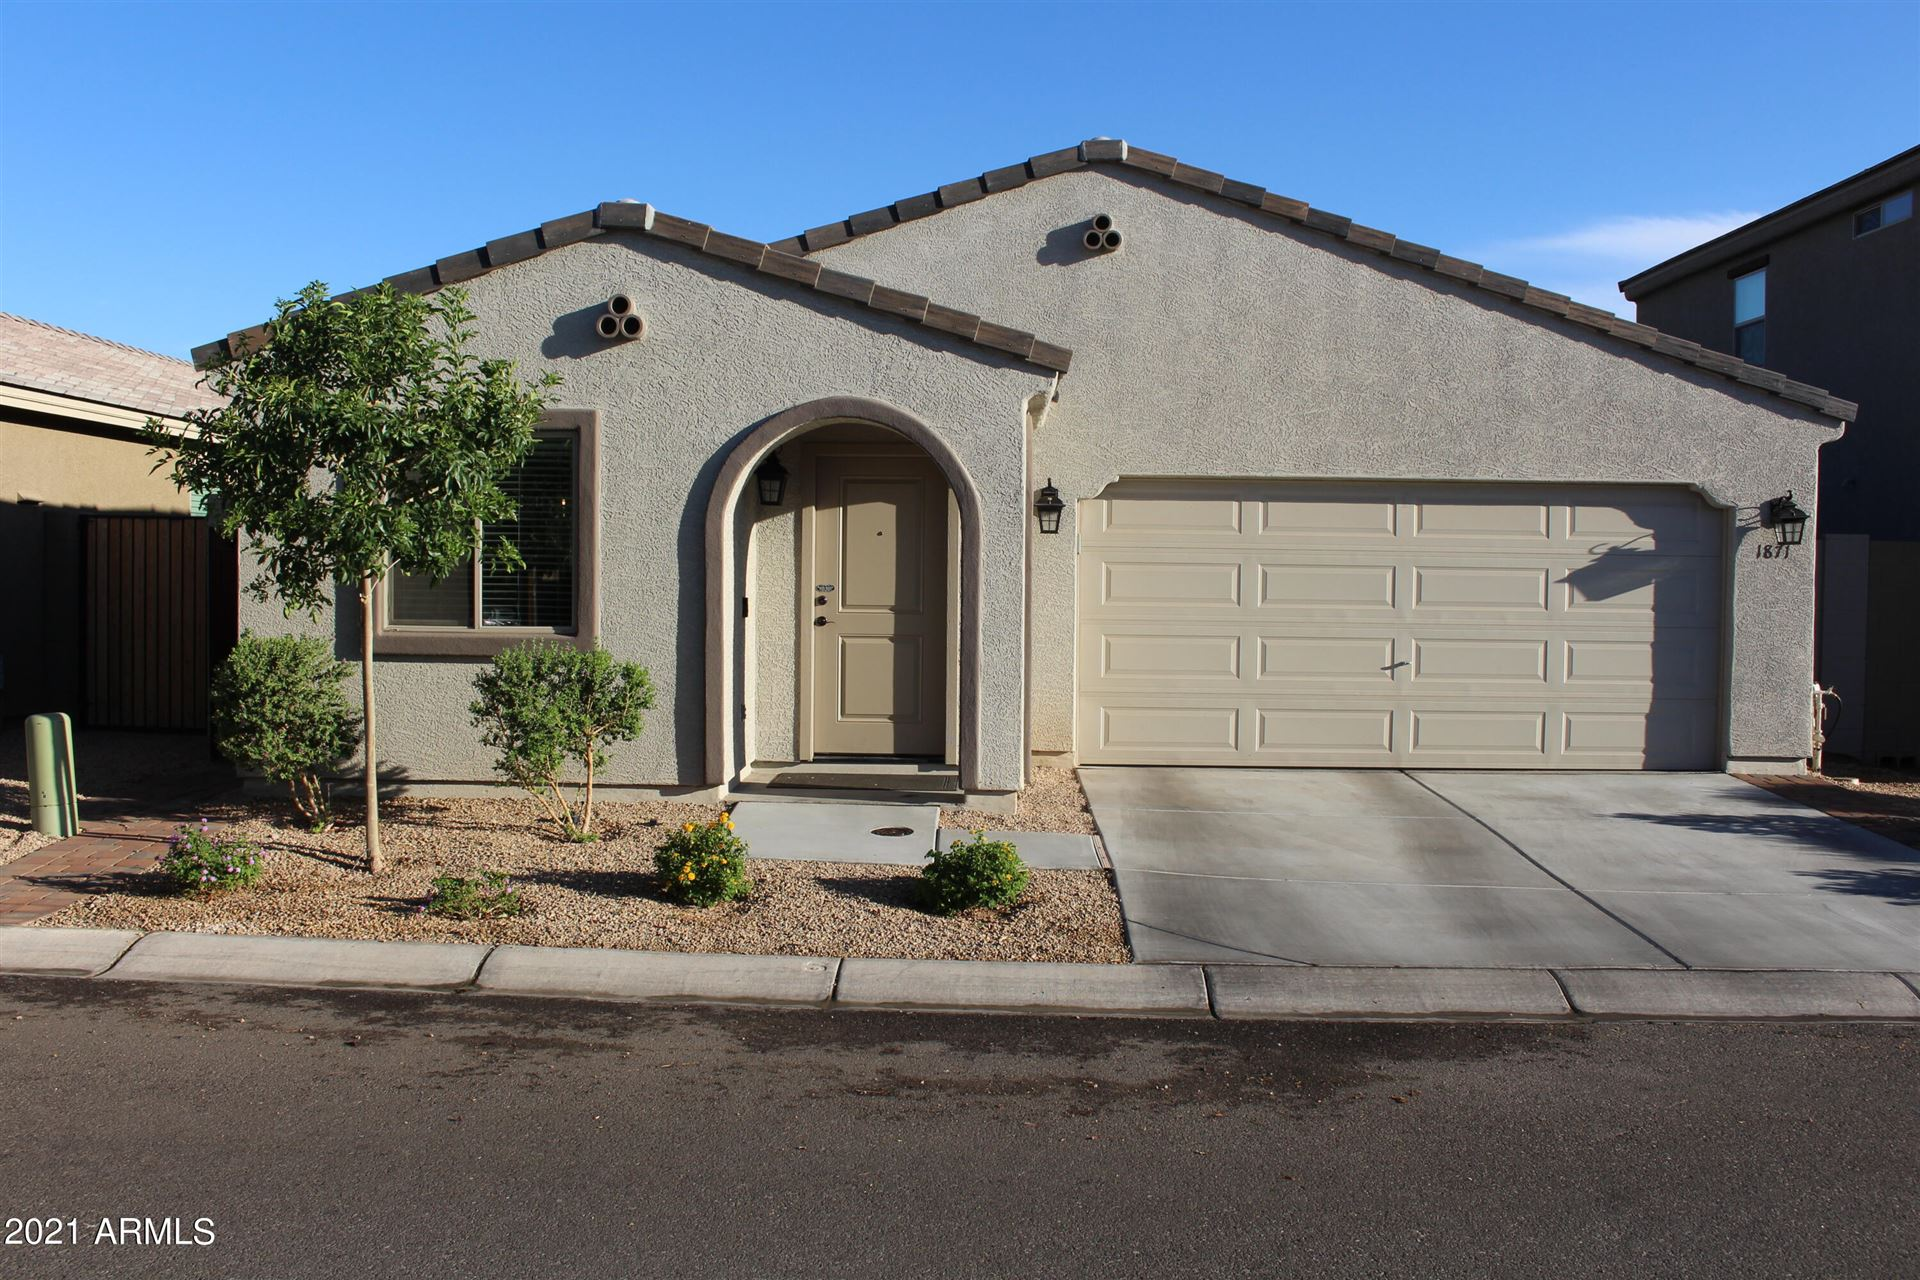 Photo of 1871 W STAGECOACH Street, Apache Junction, AZ 85120 (MLS # 6248232)